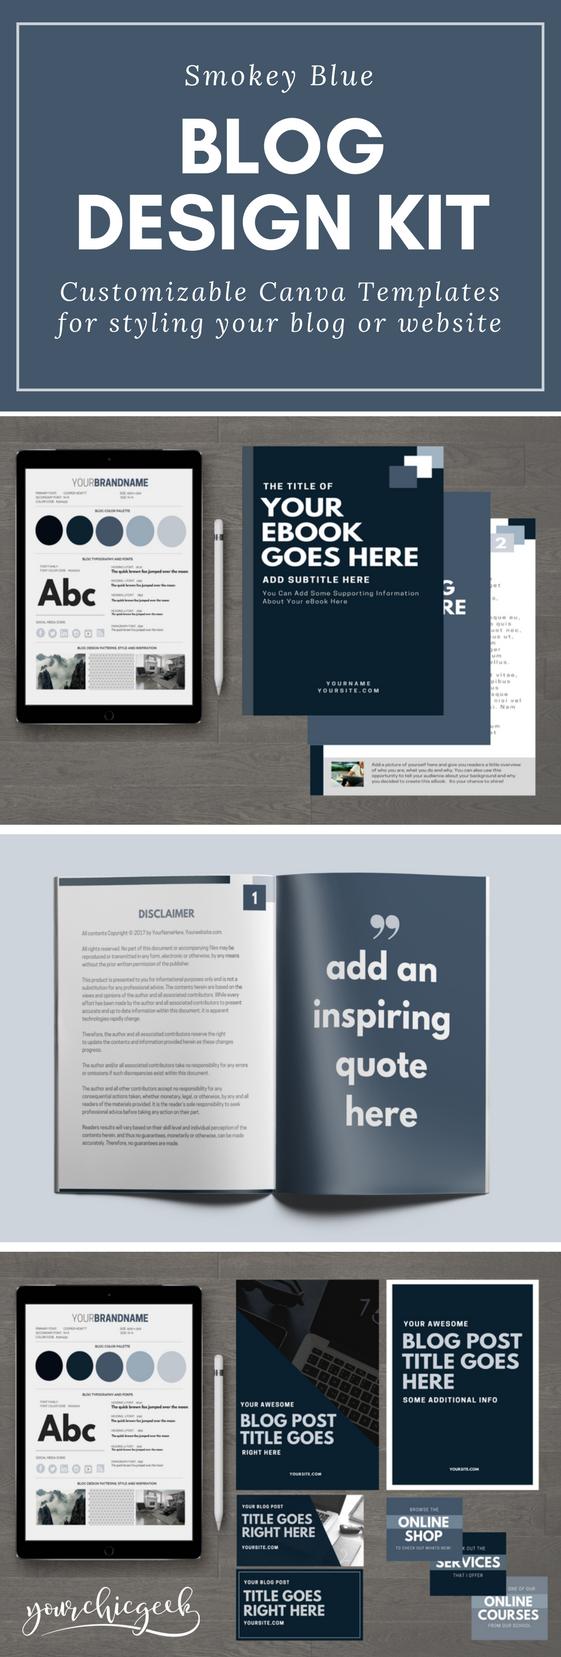 Smokey Blue Blog and Website Design Kit